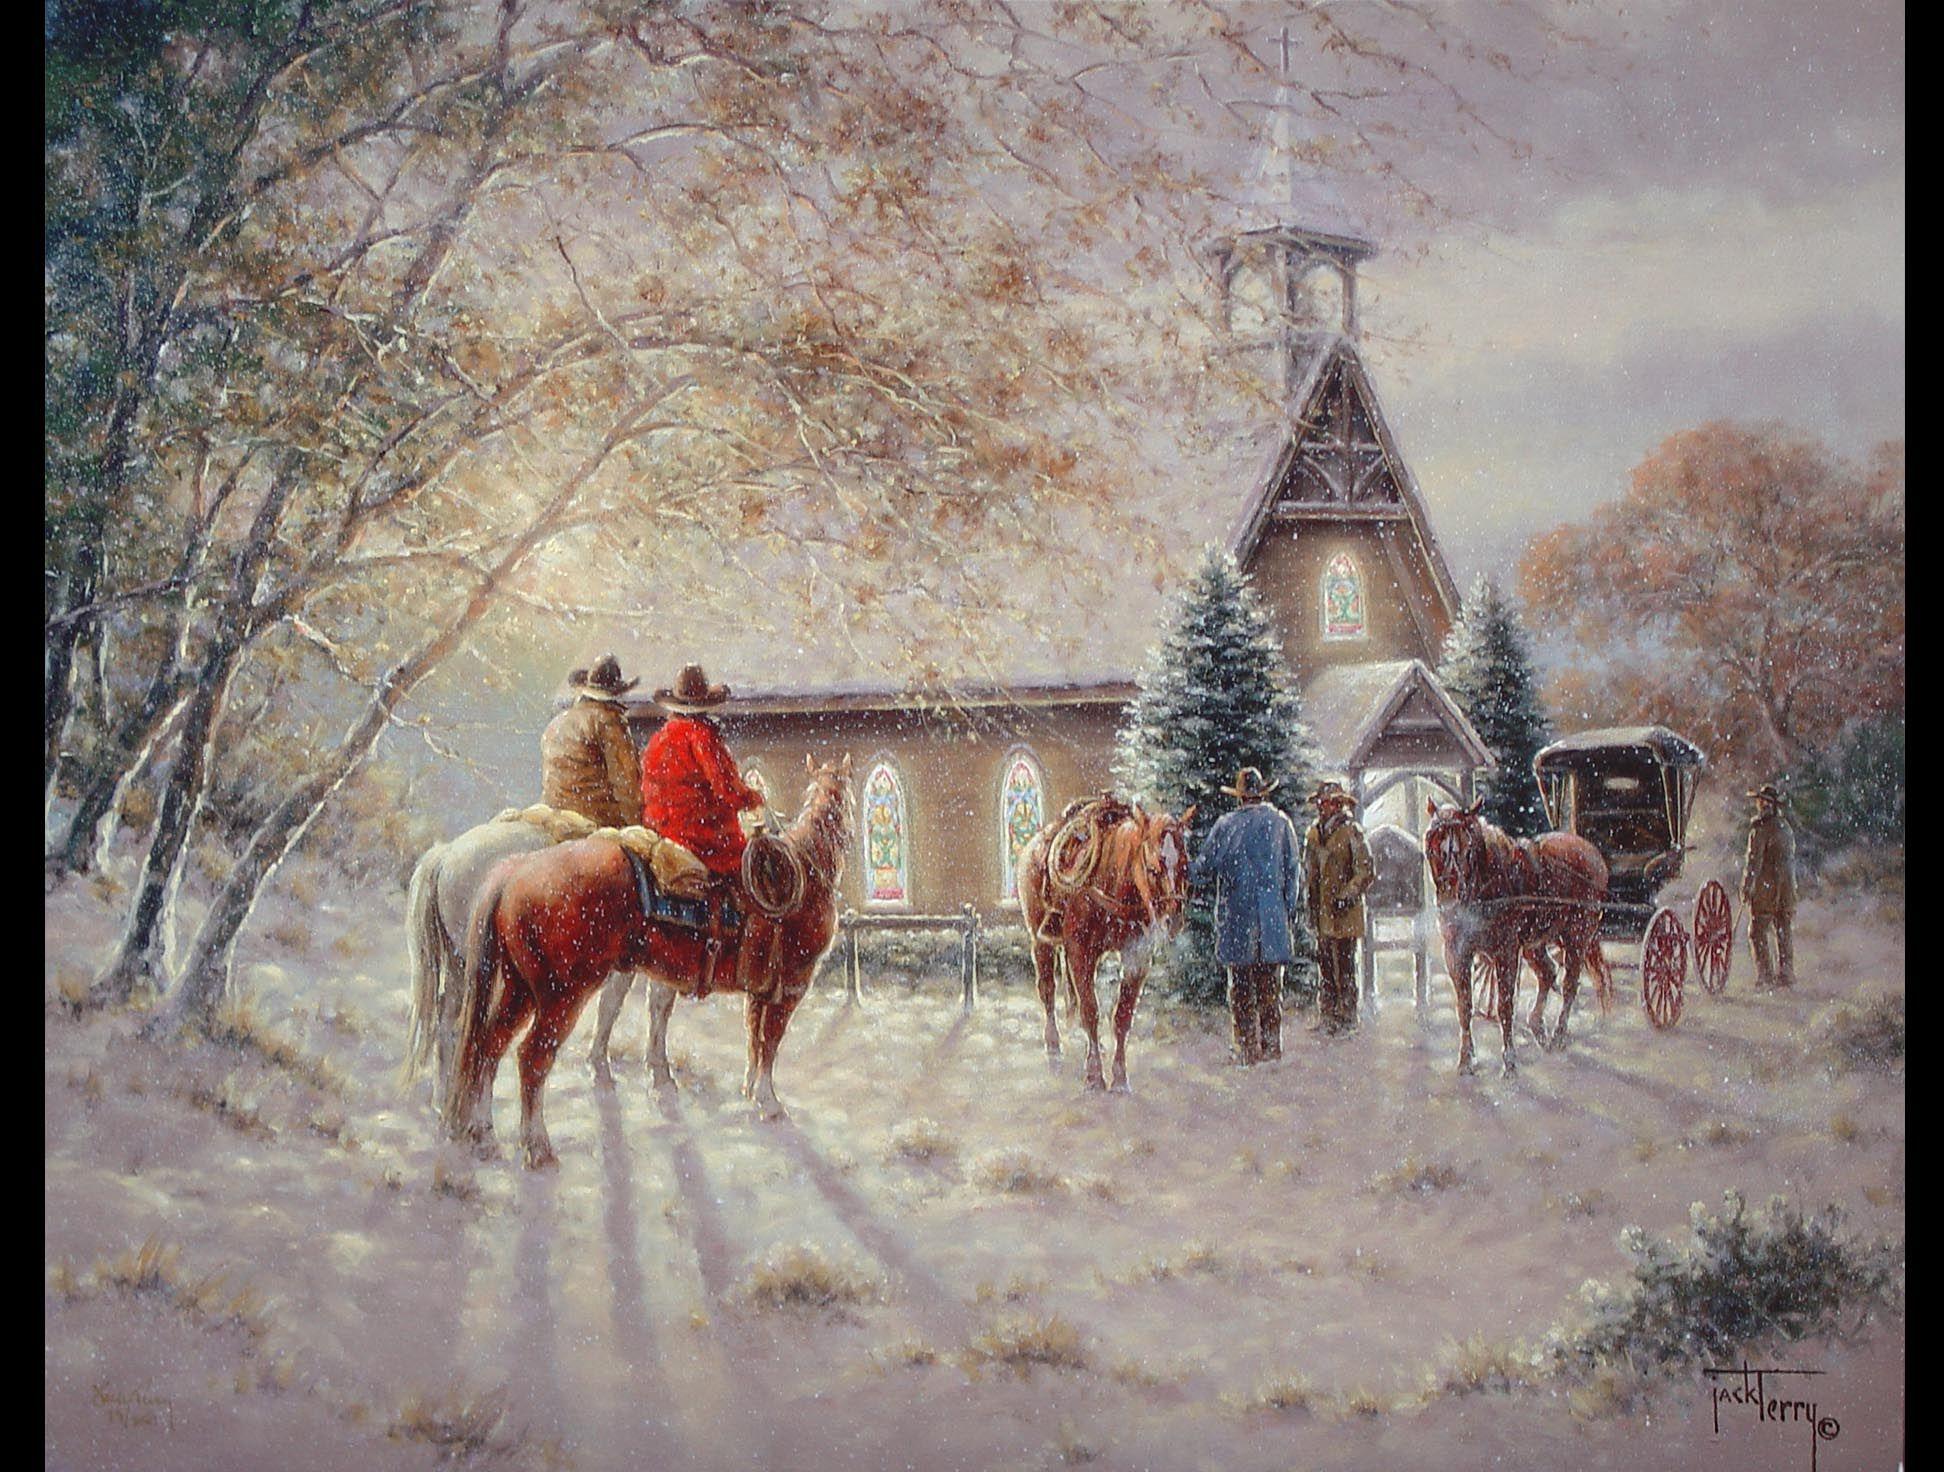 Western And Screensaver Wallpaper Christmas